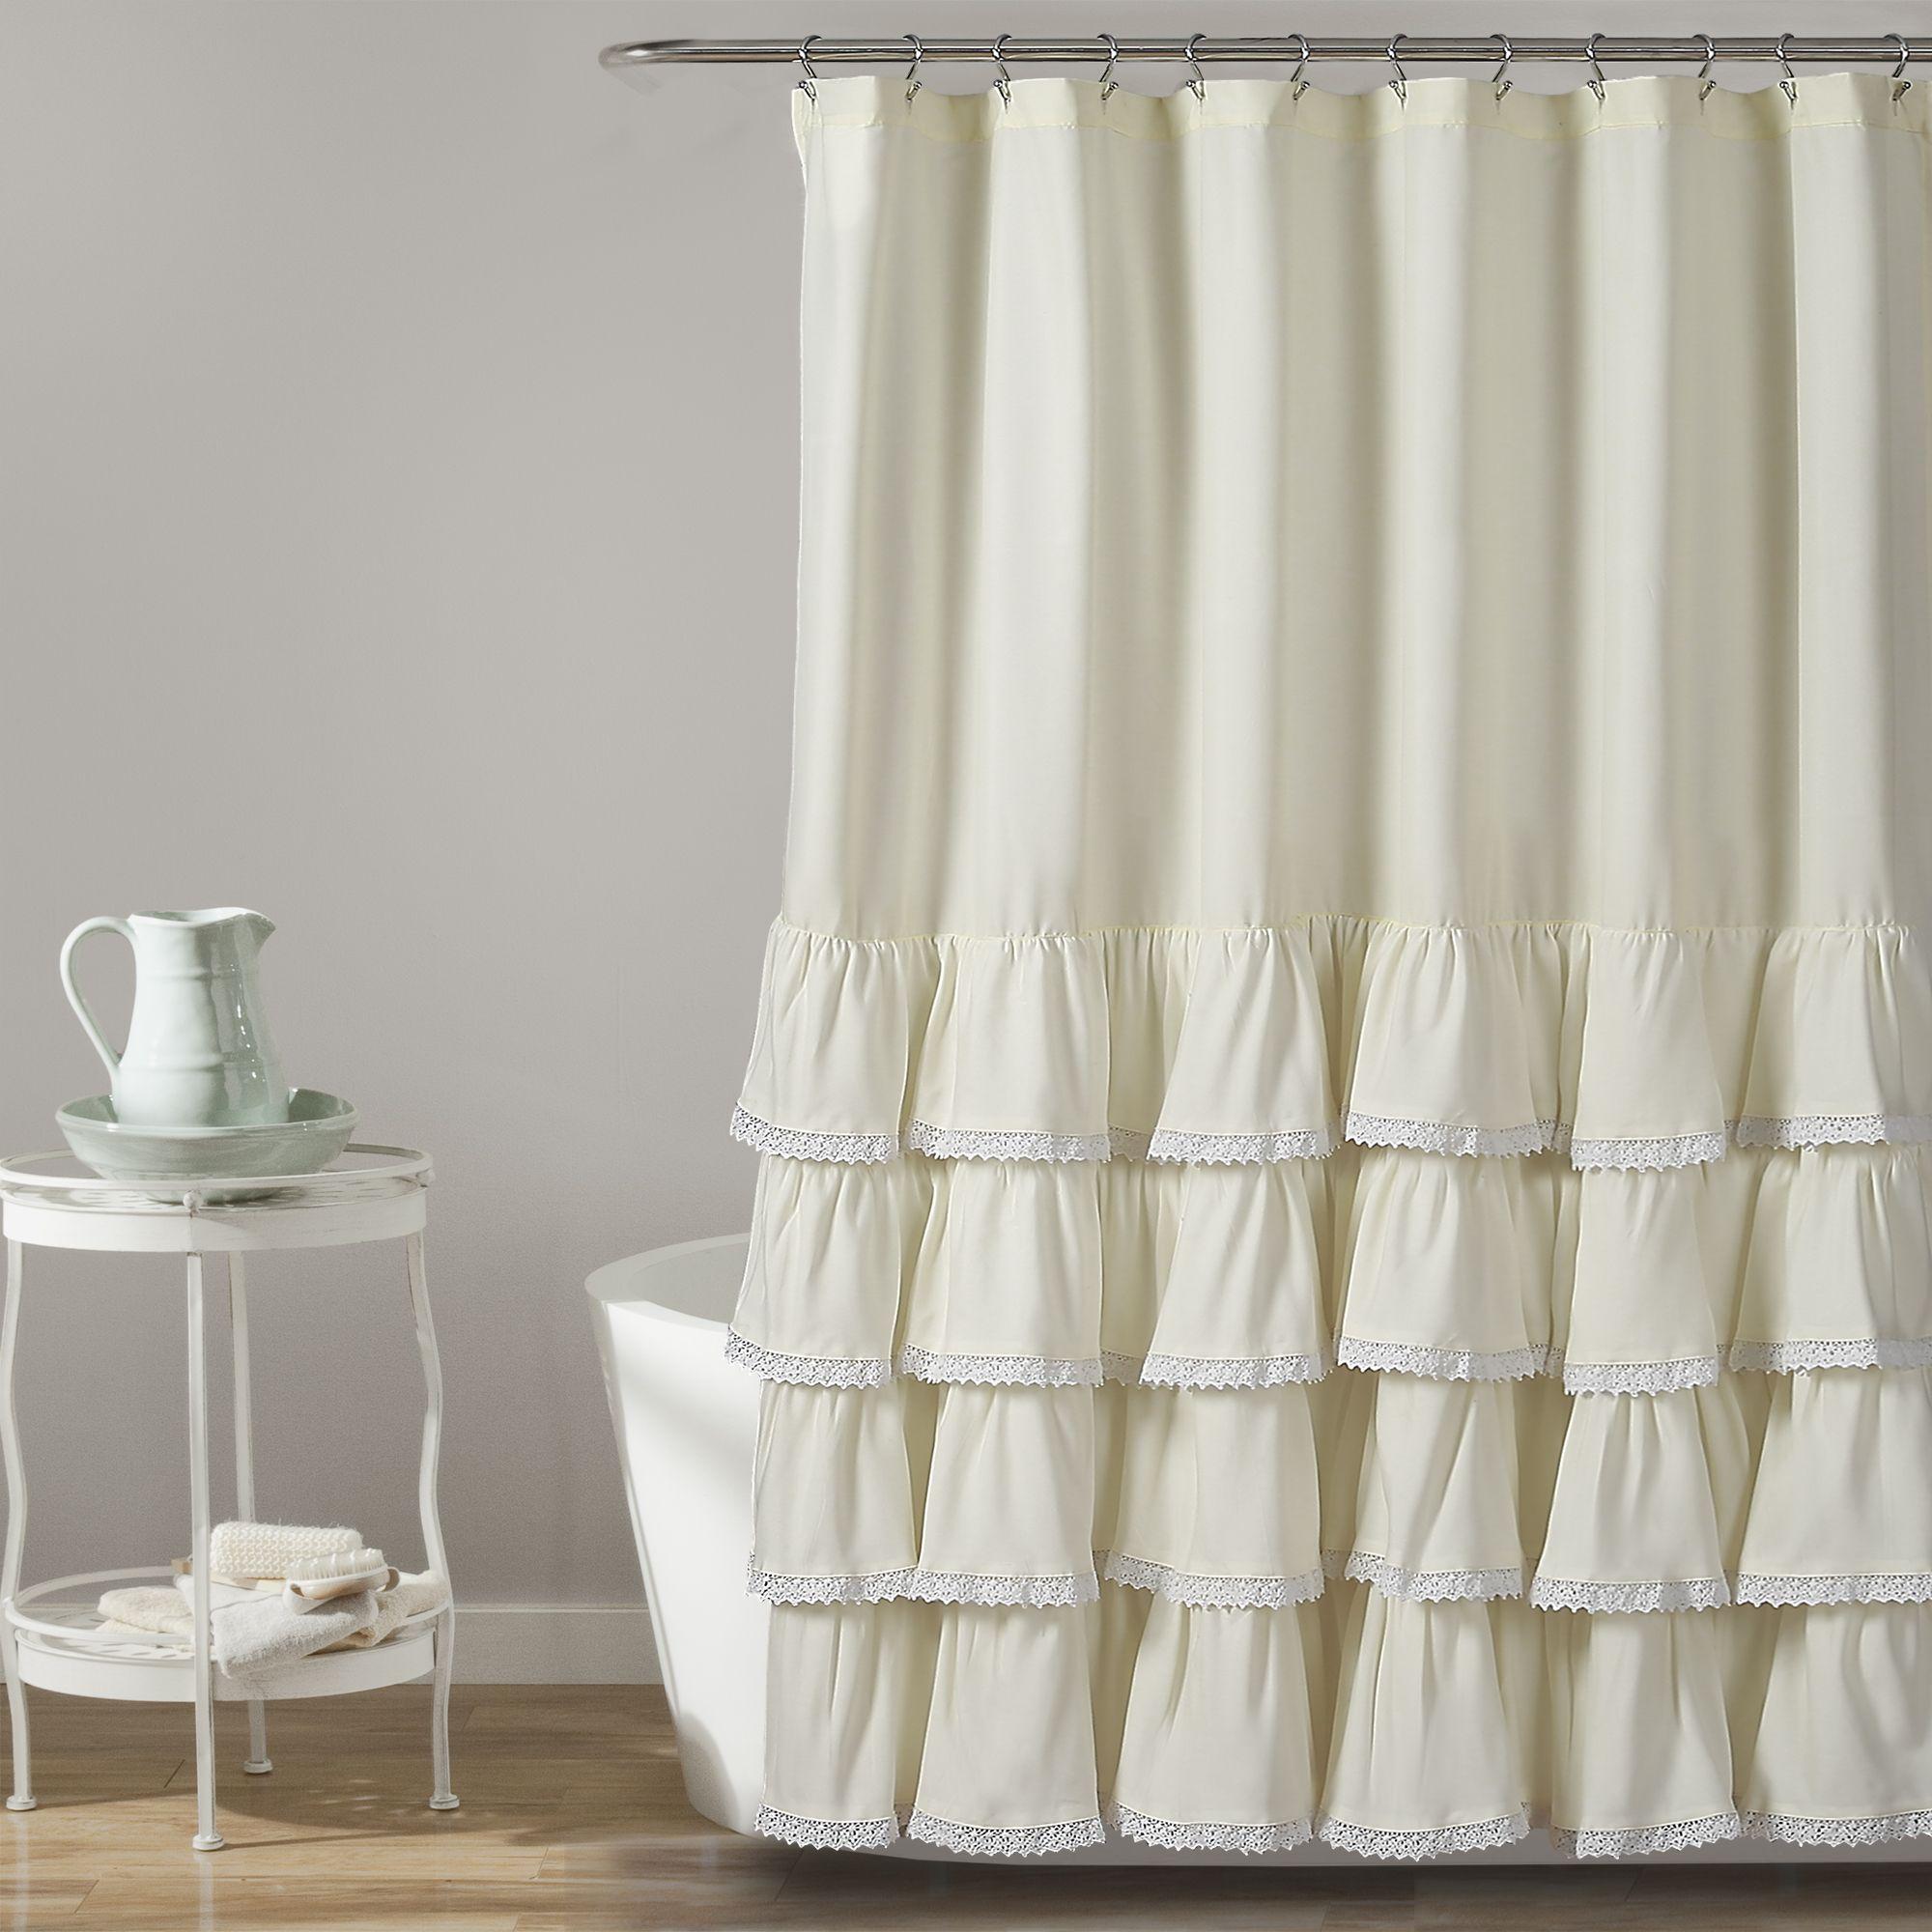 Ella Lace Ruffle Shower Curtain